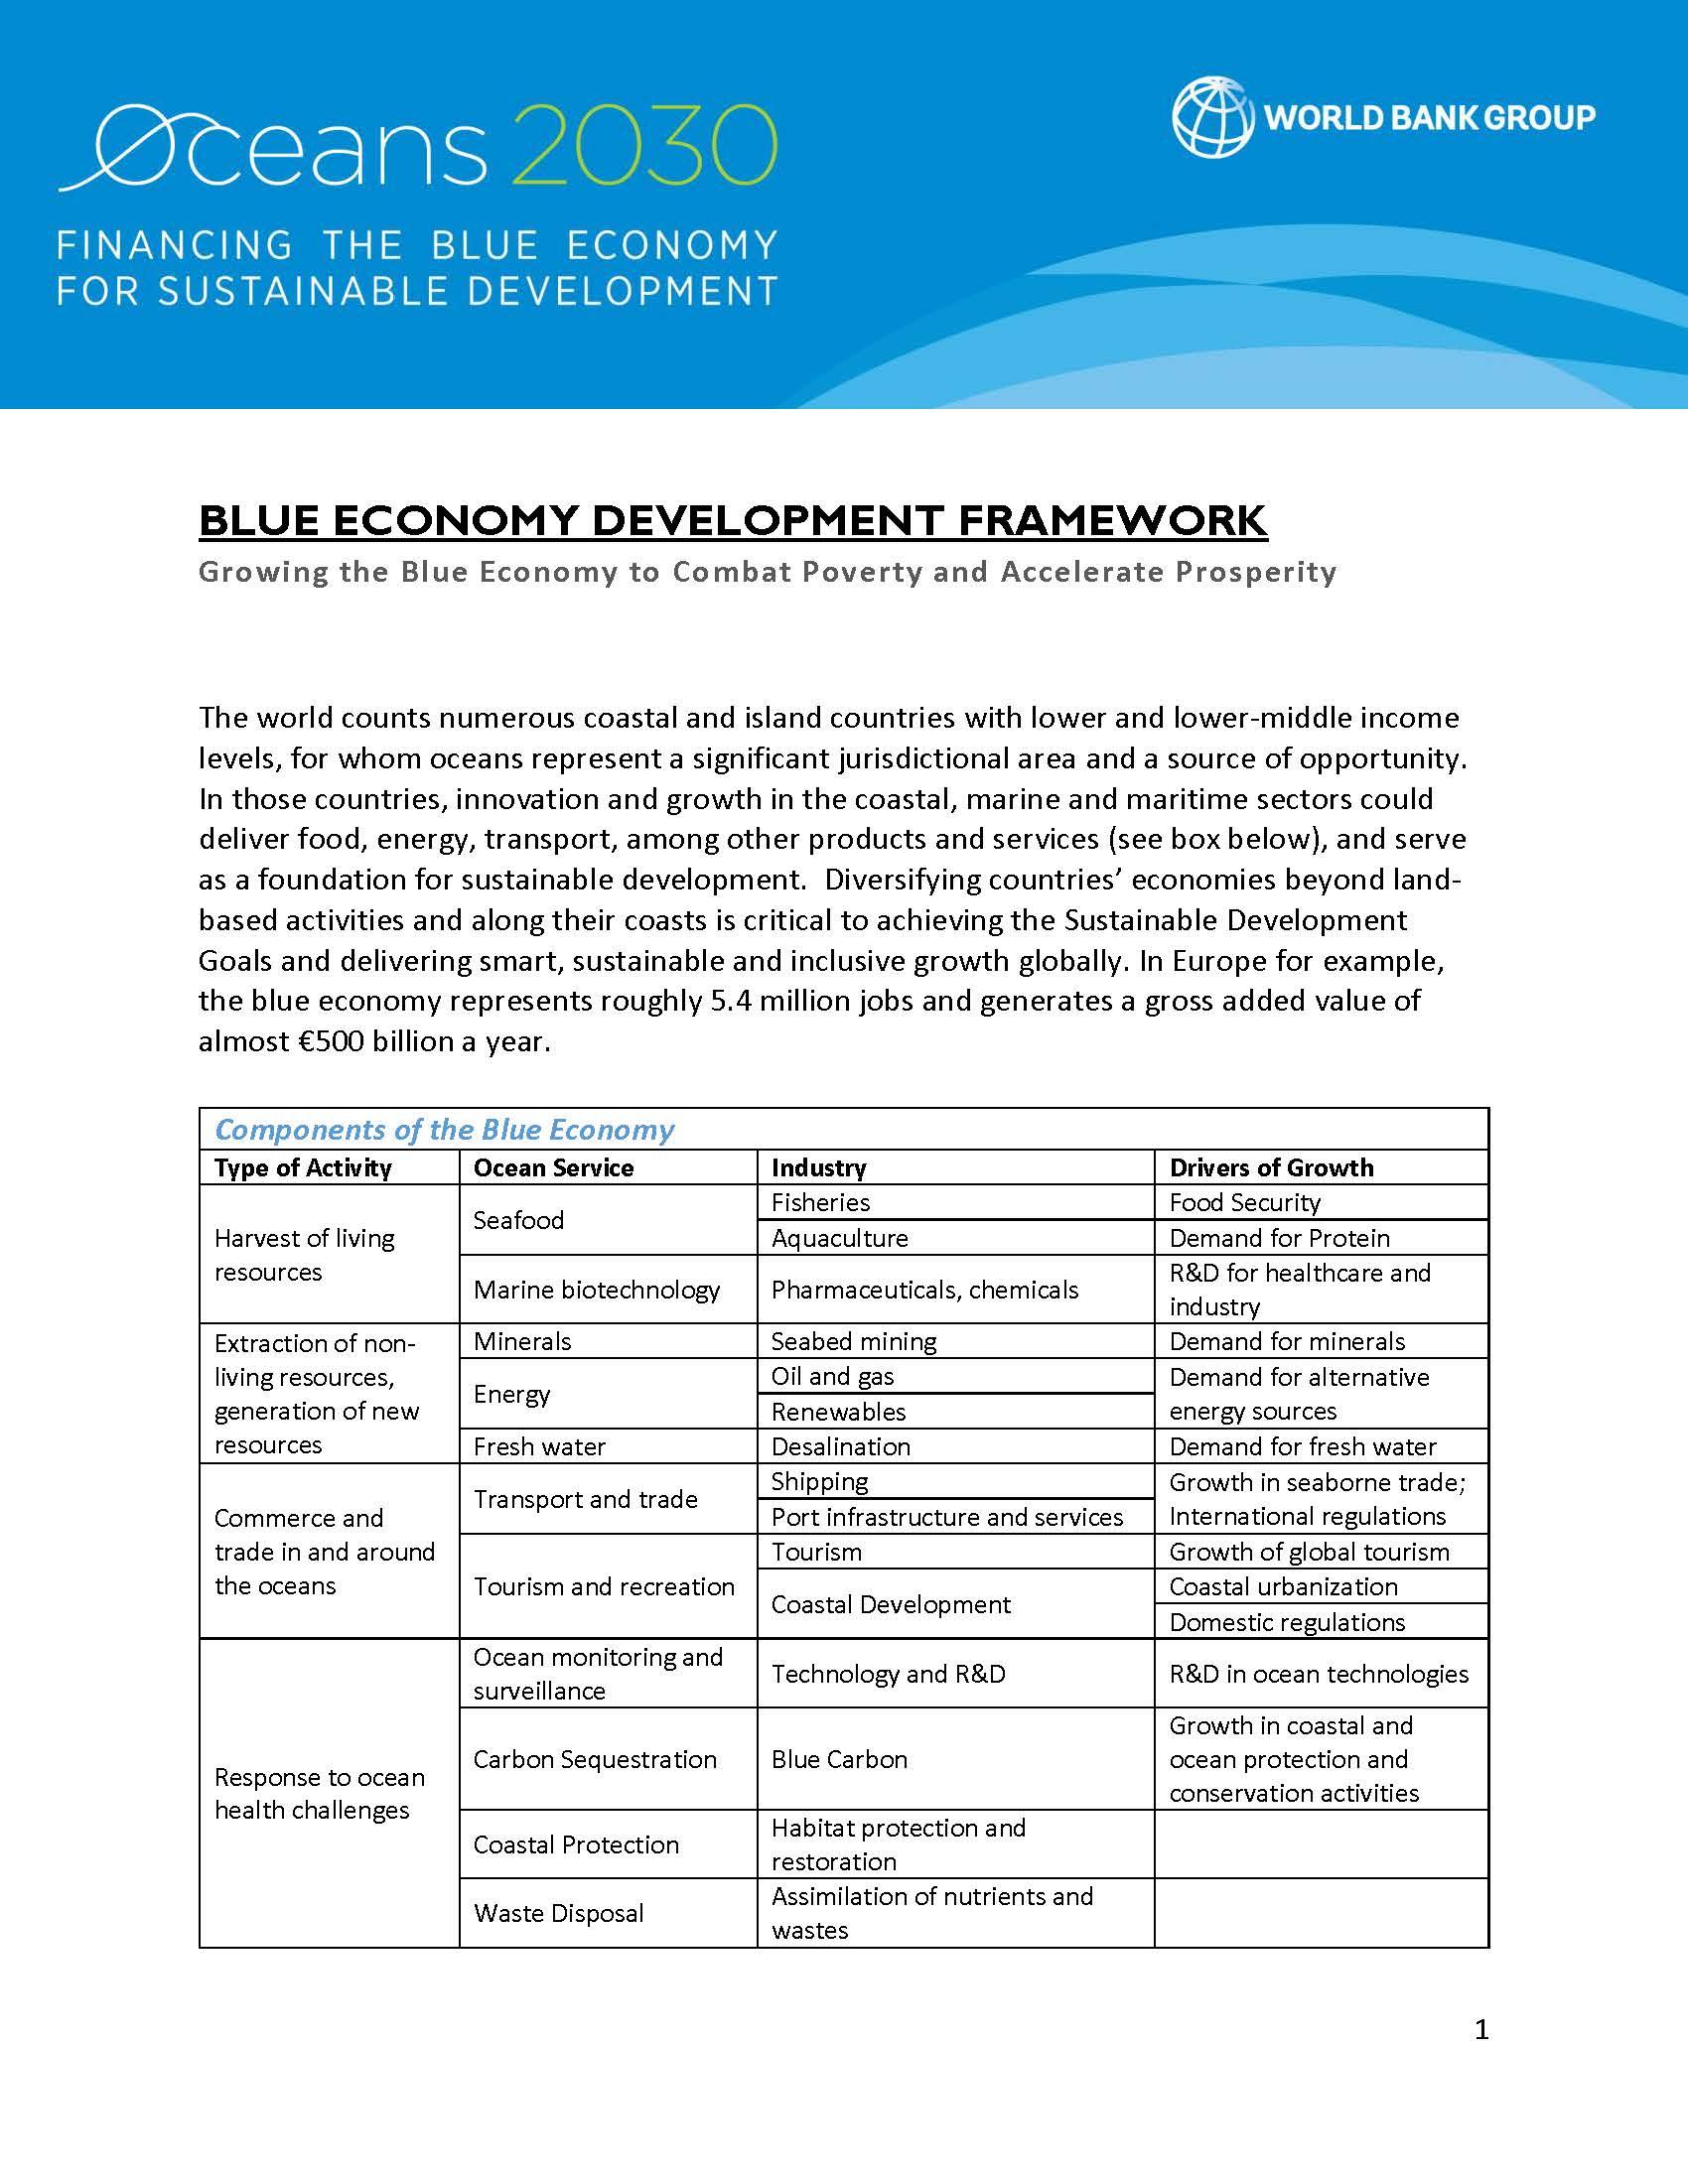 Blue Economy Development Framework